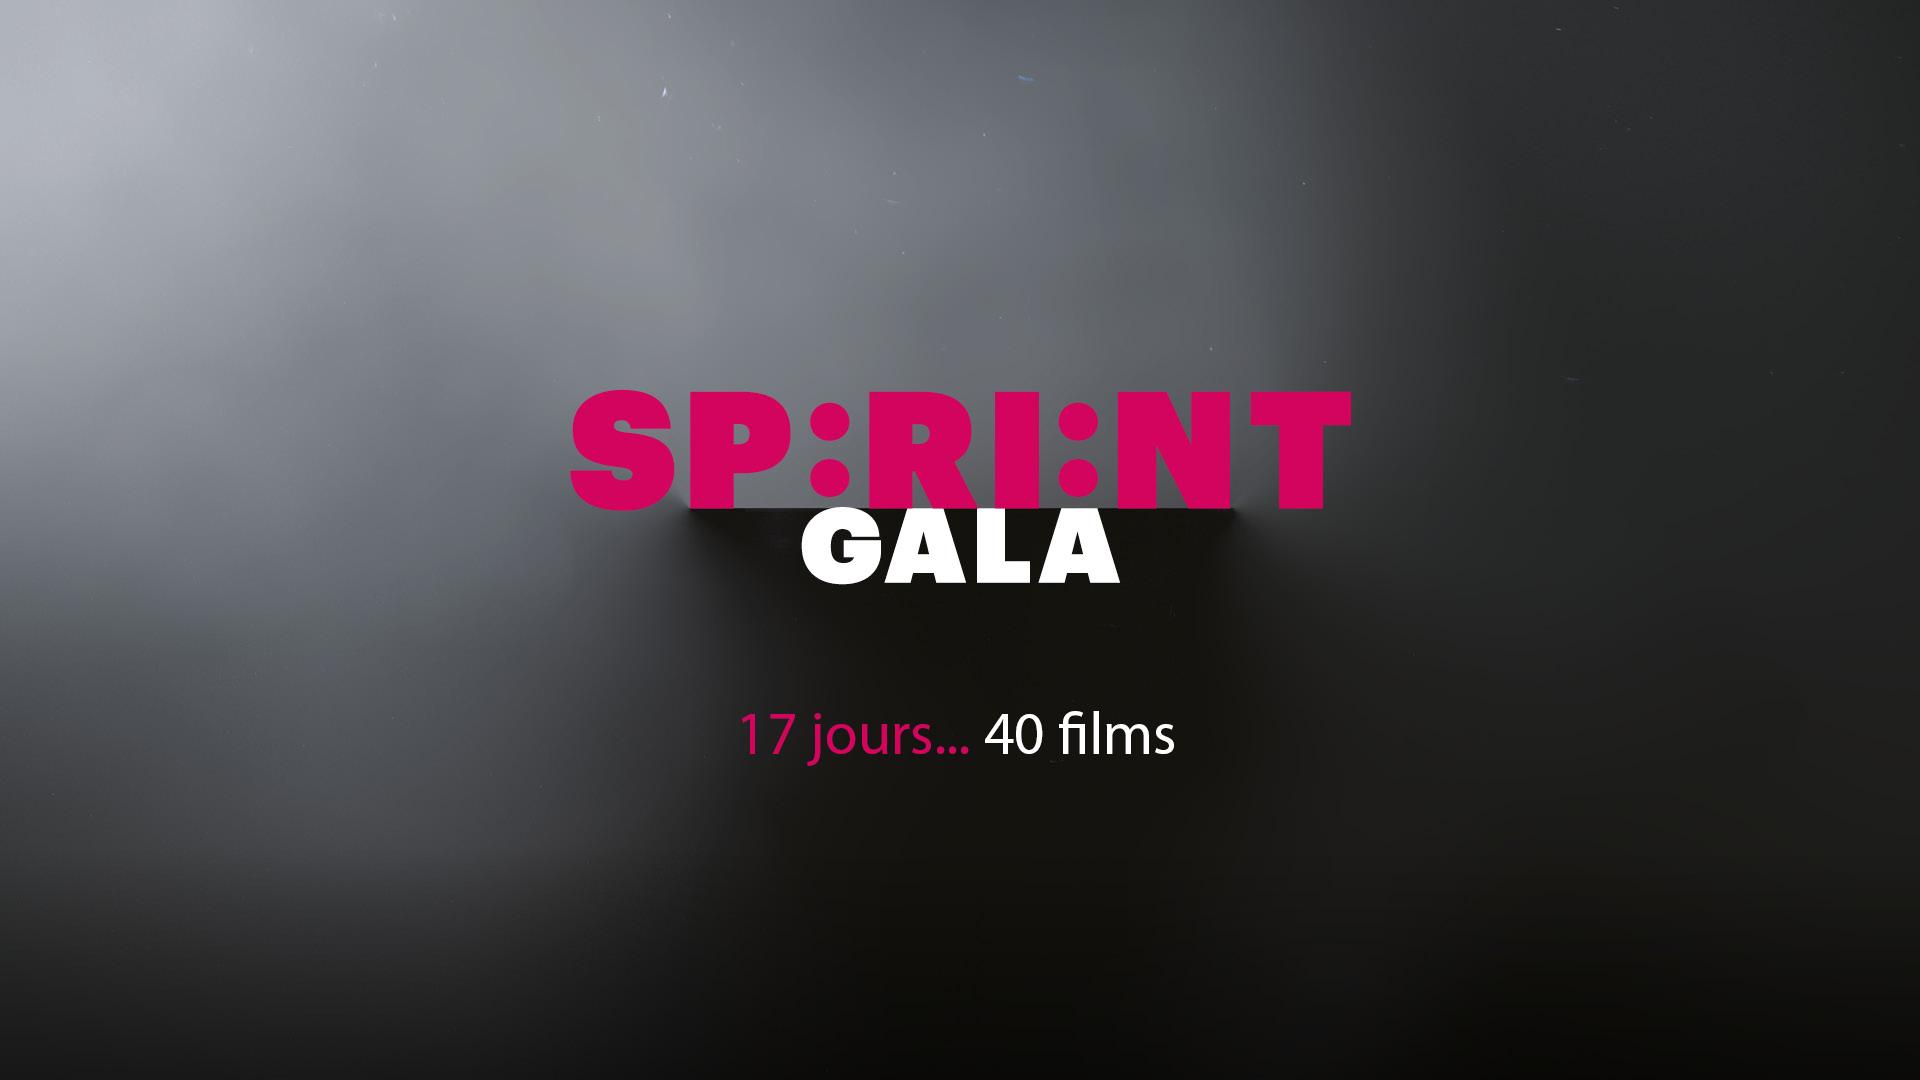 SPRINT Gala 2019 – The best of Quebec cinema